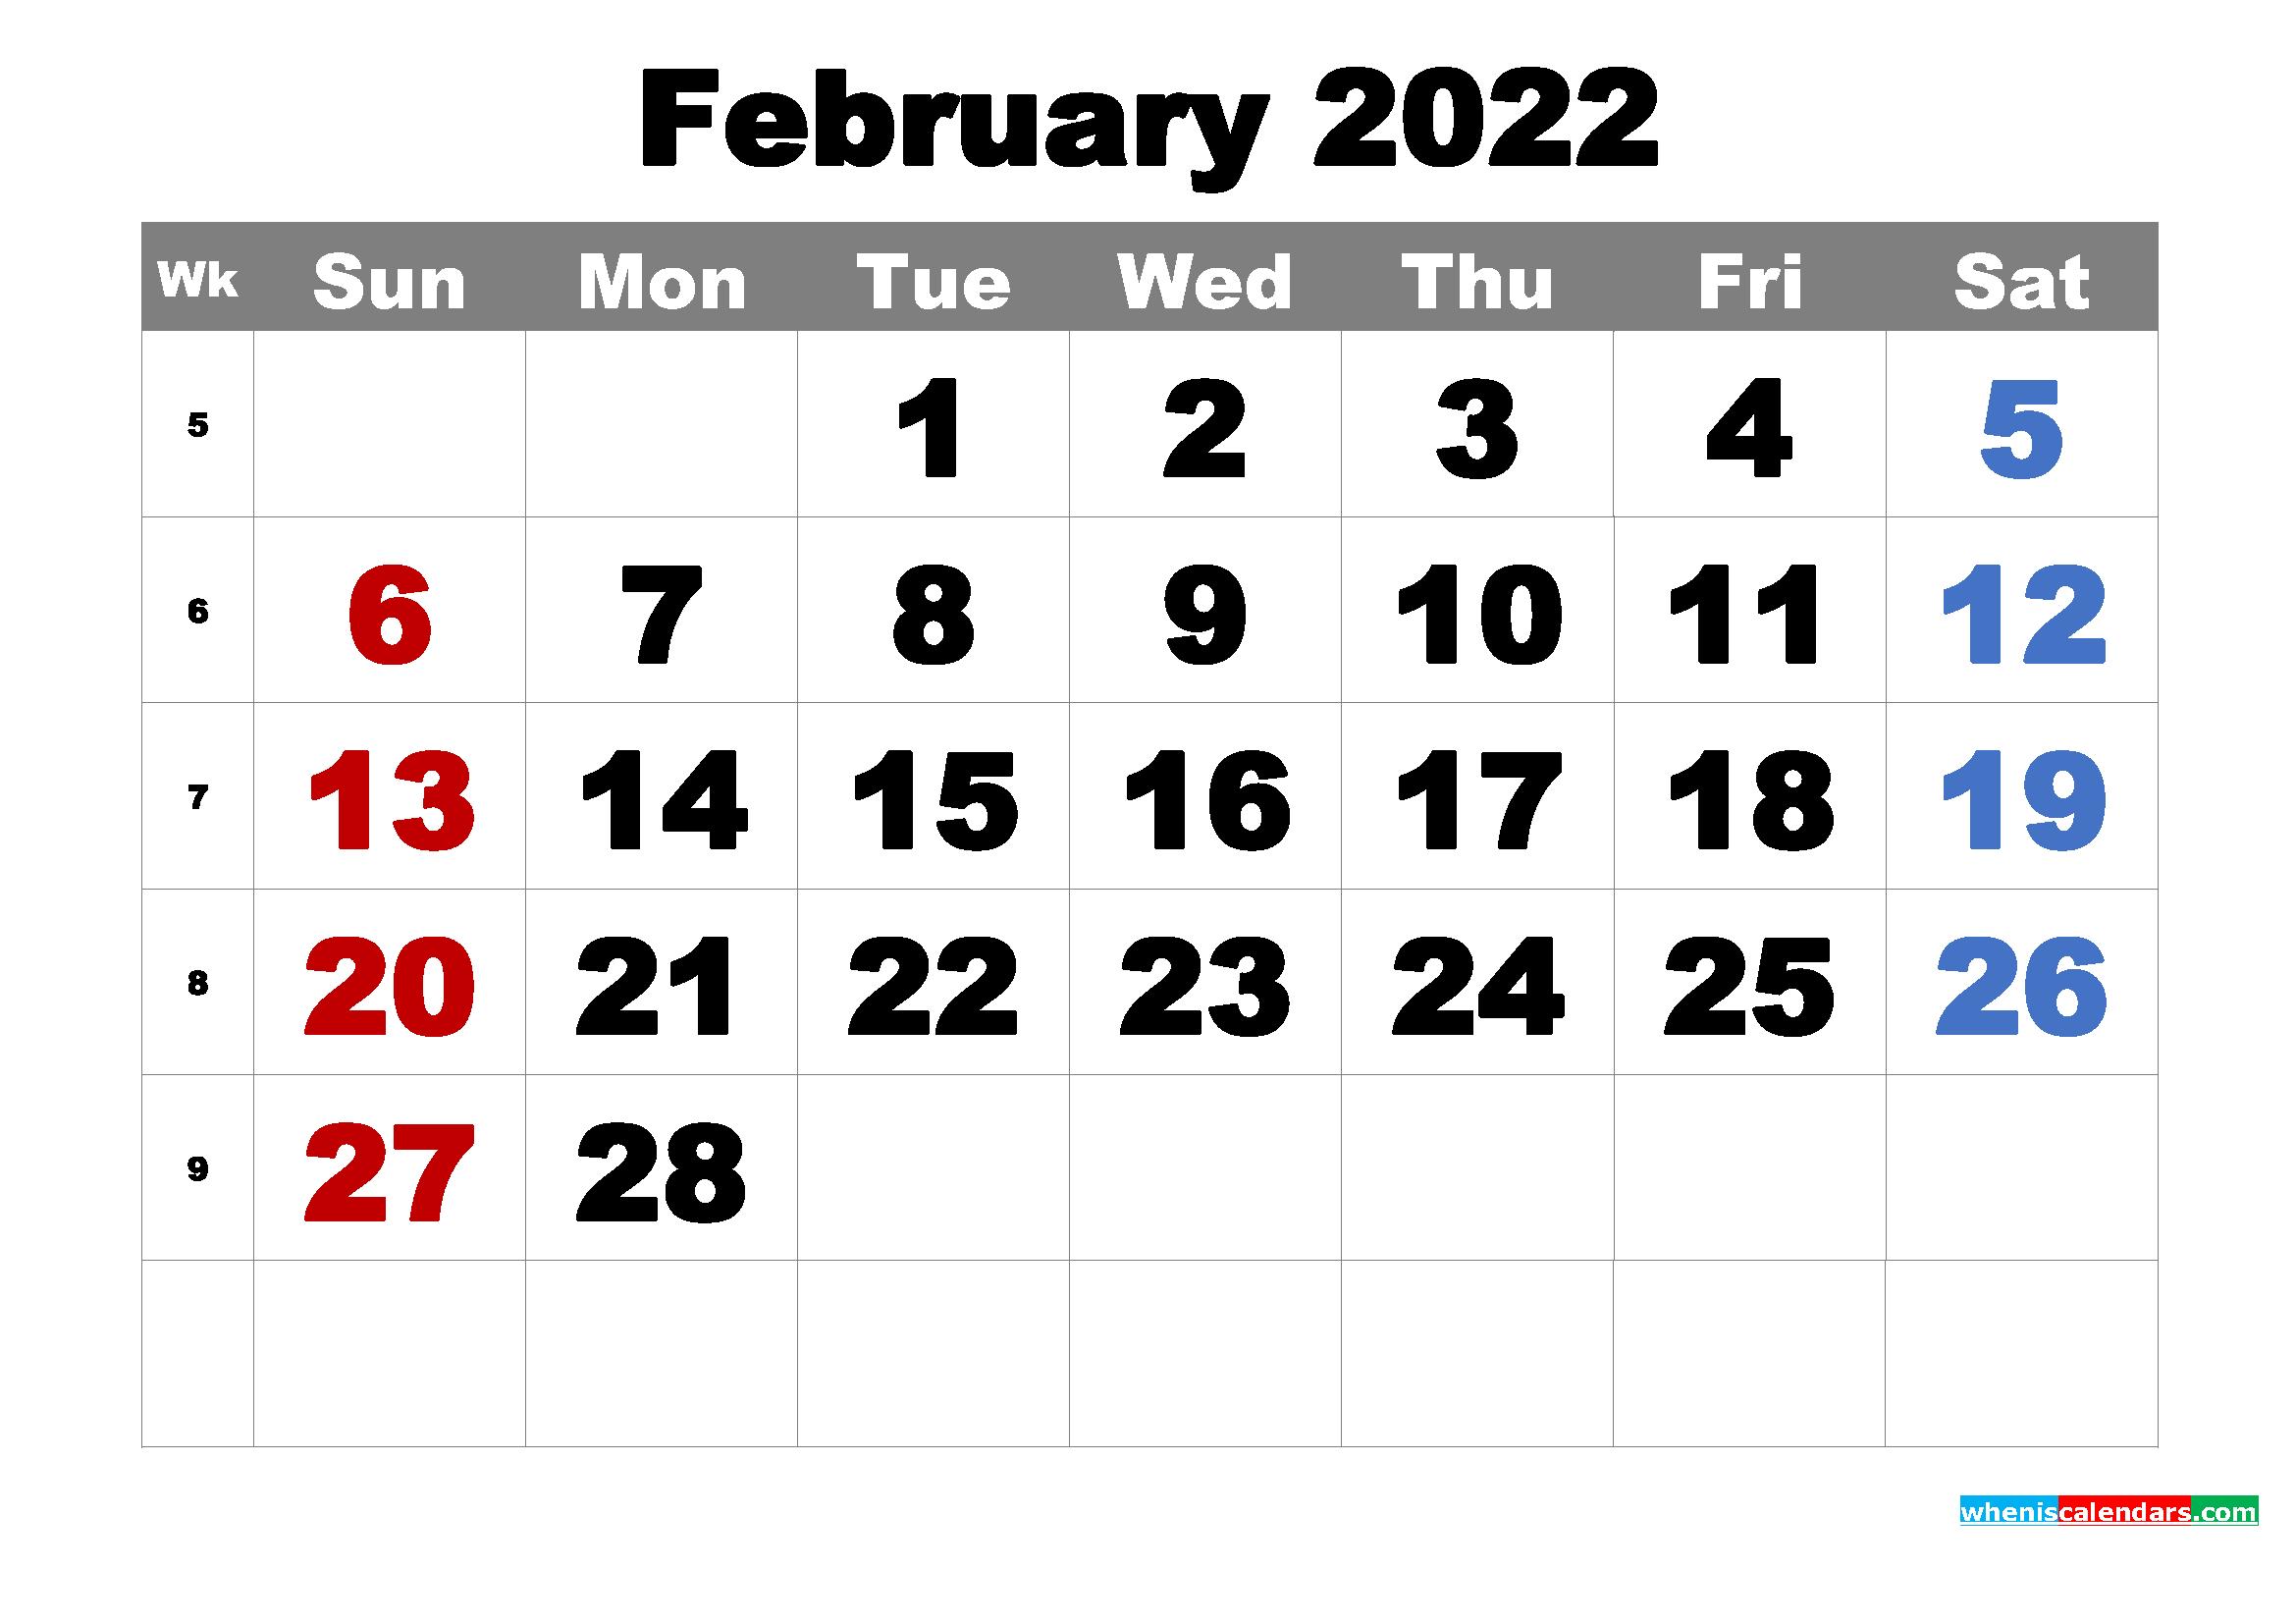 Free Printable February 2022 Calendar Word, PDF, Image